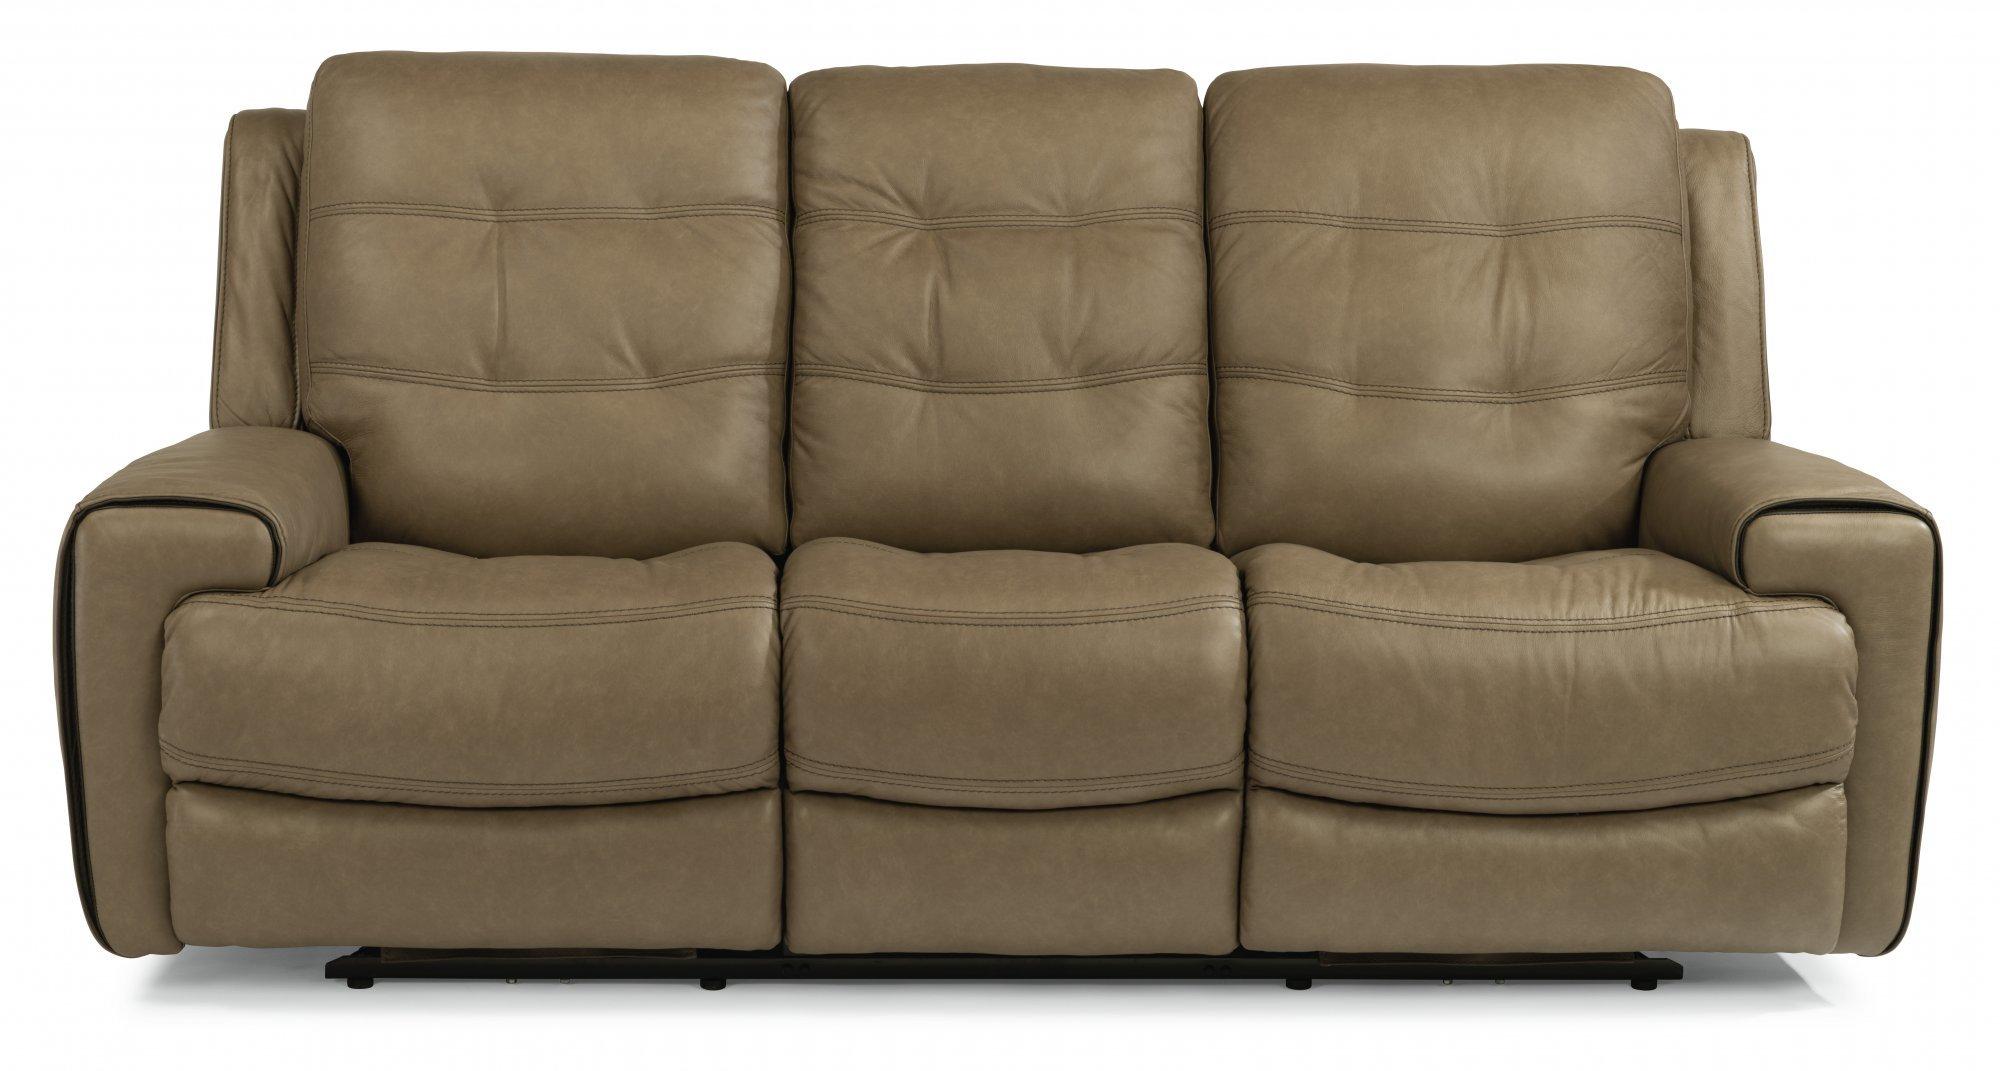 wicklow 2pc living room setflexsteel furniture  the